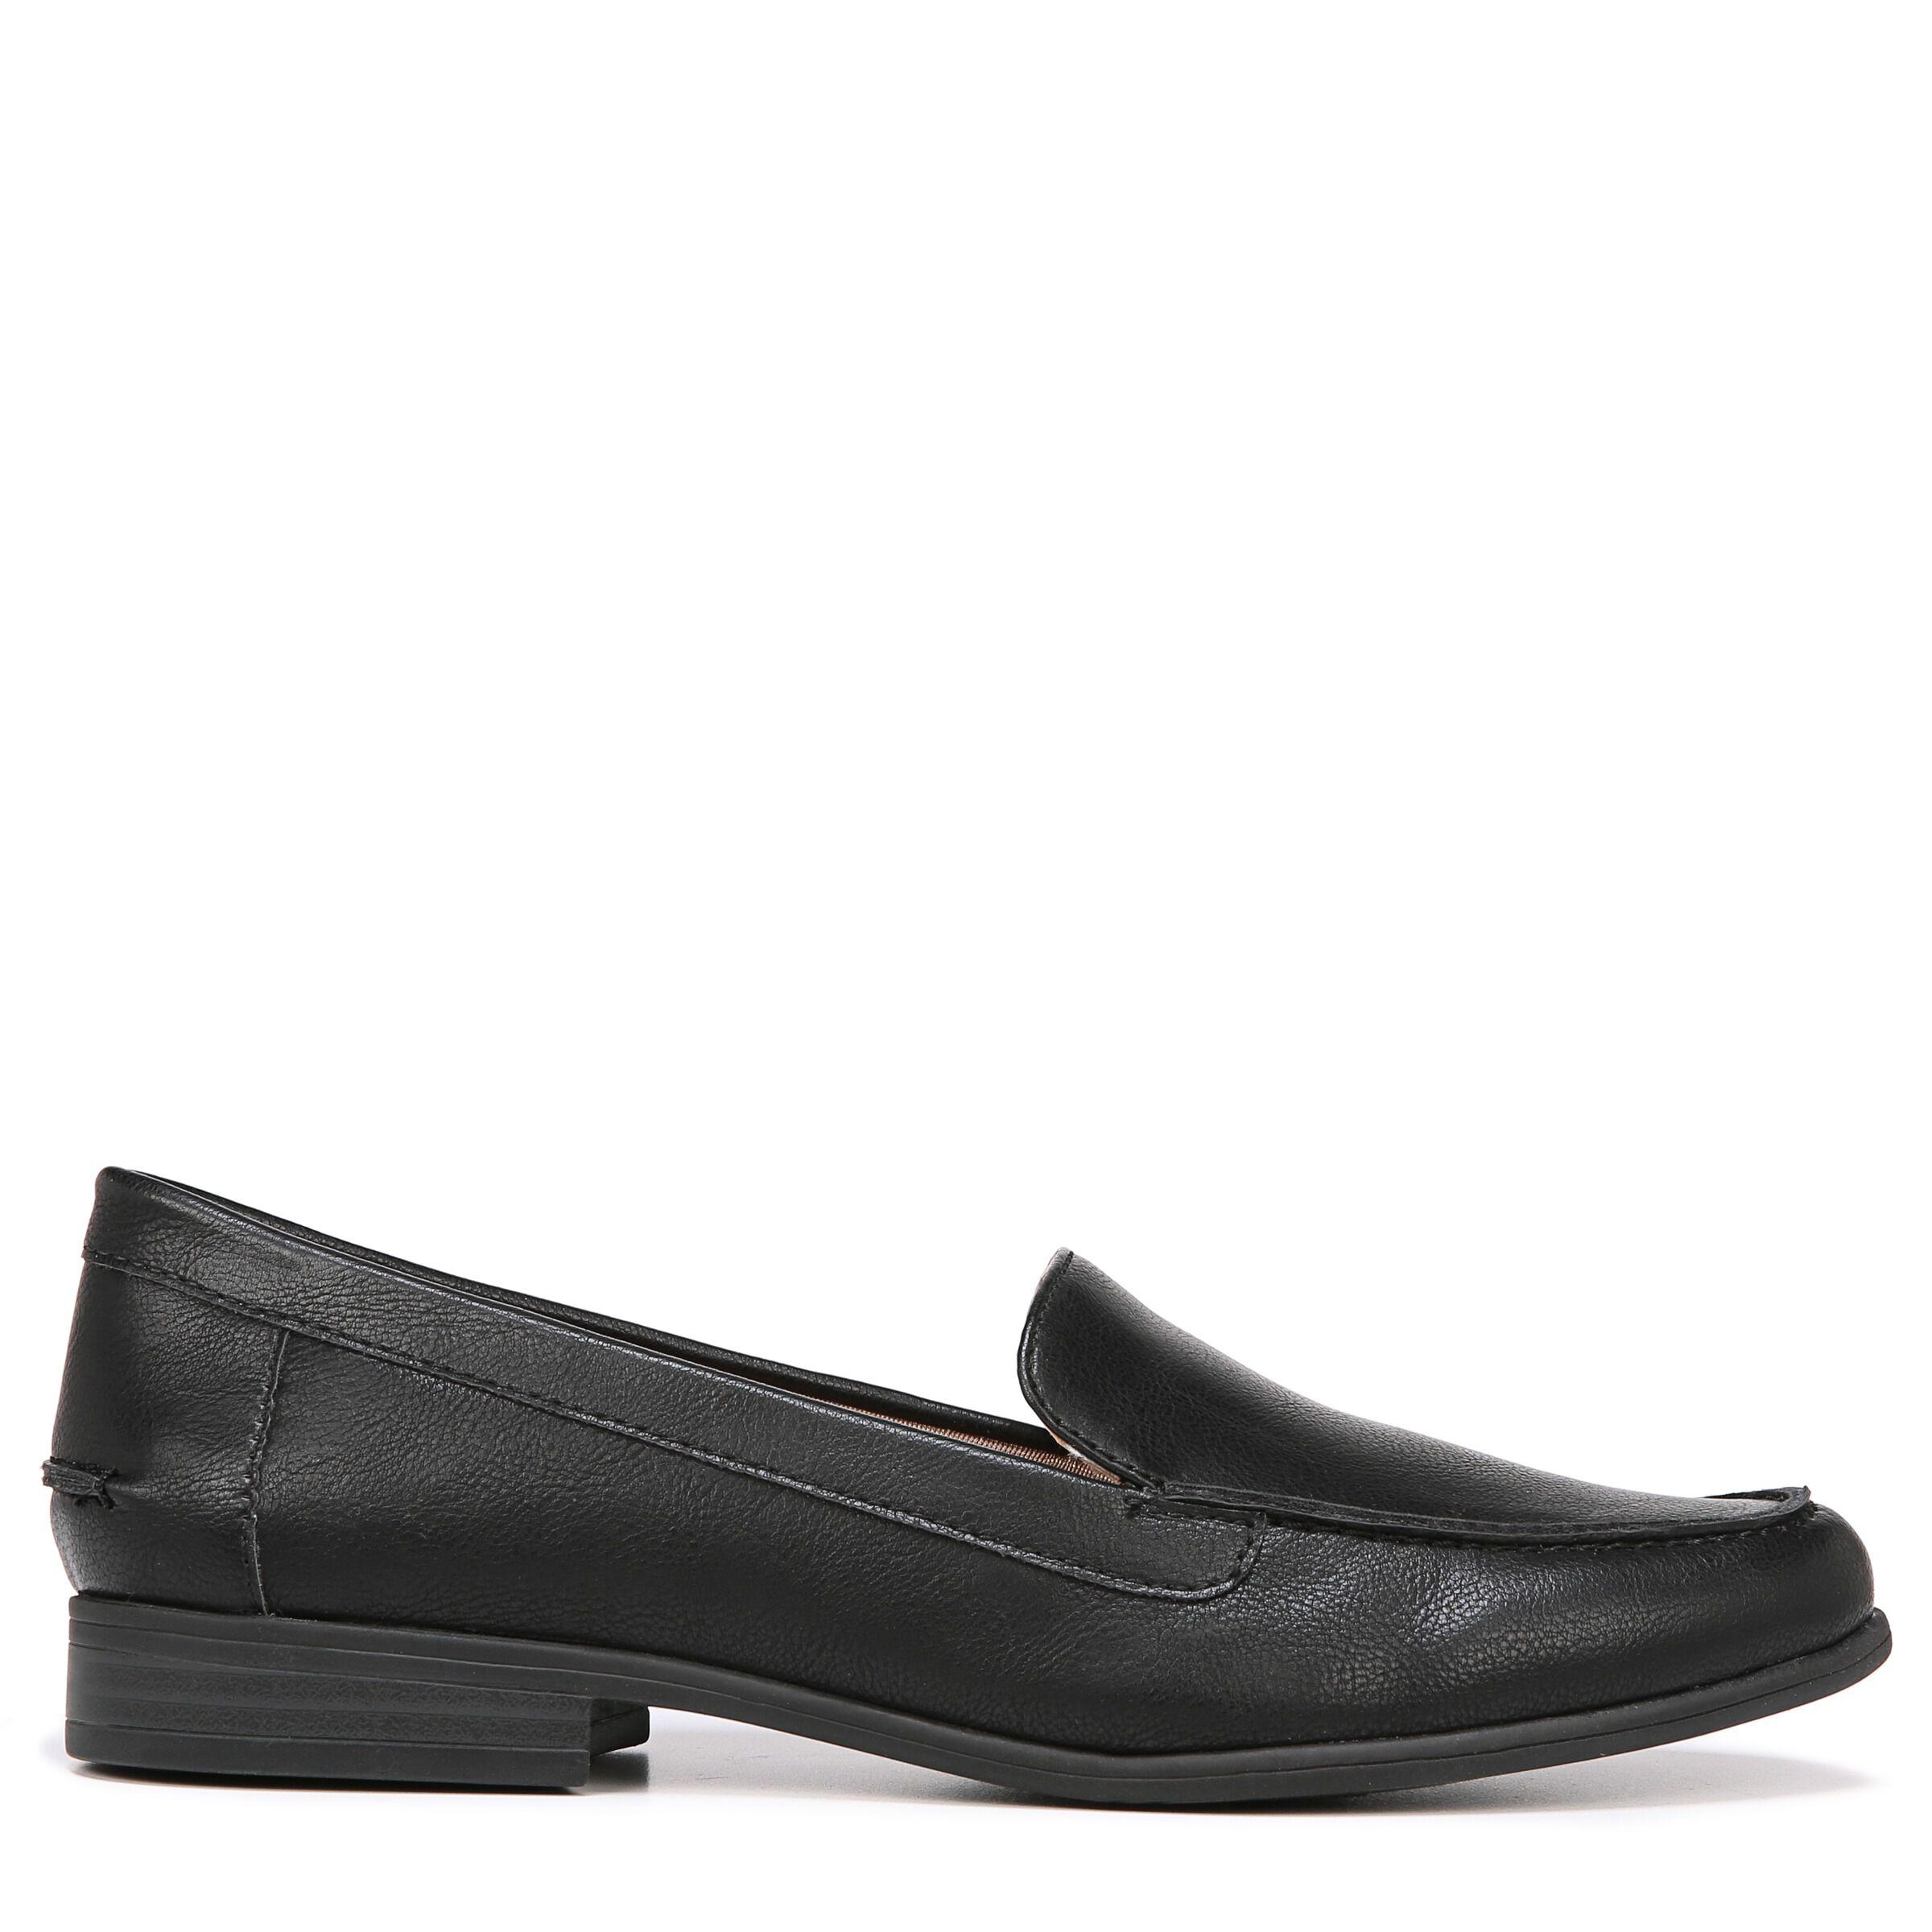 Women's LifeStride Margot Shoes Black